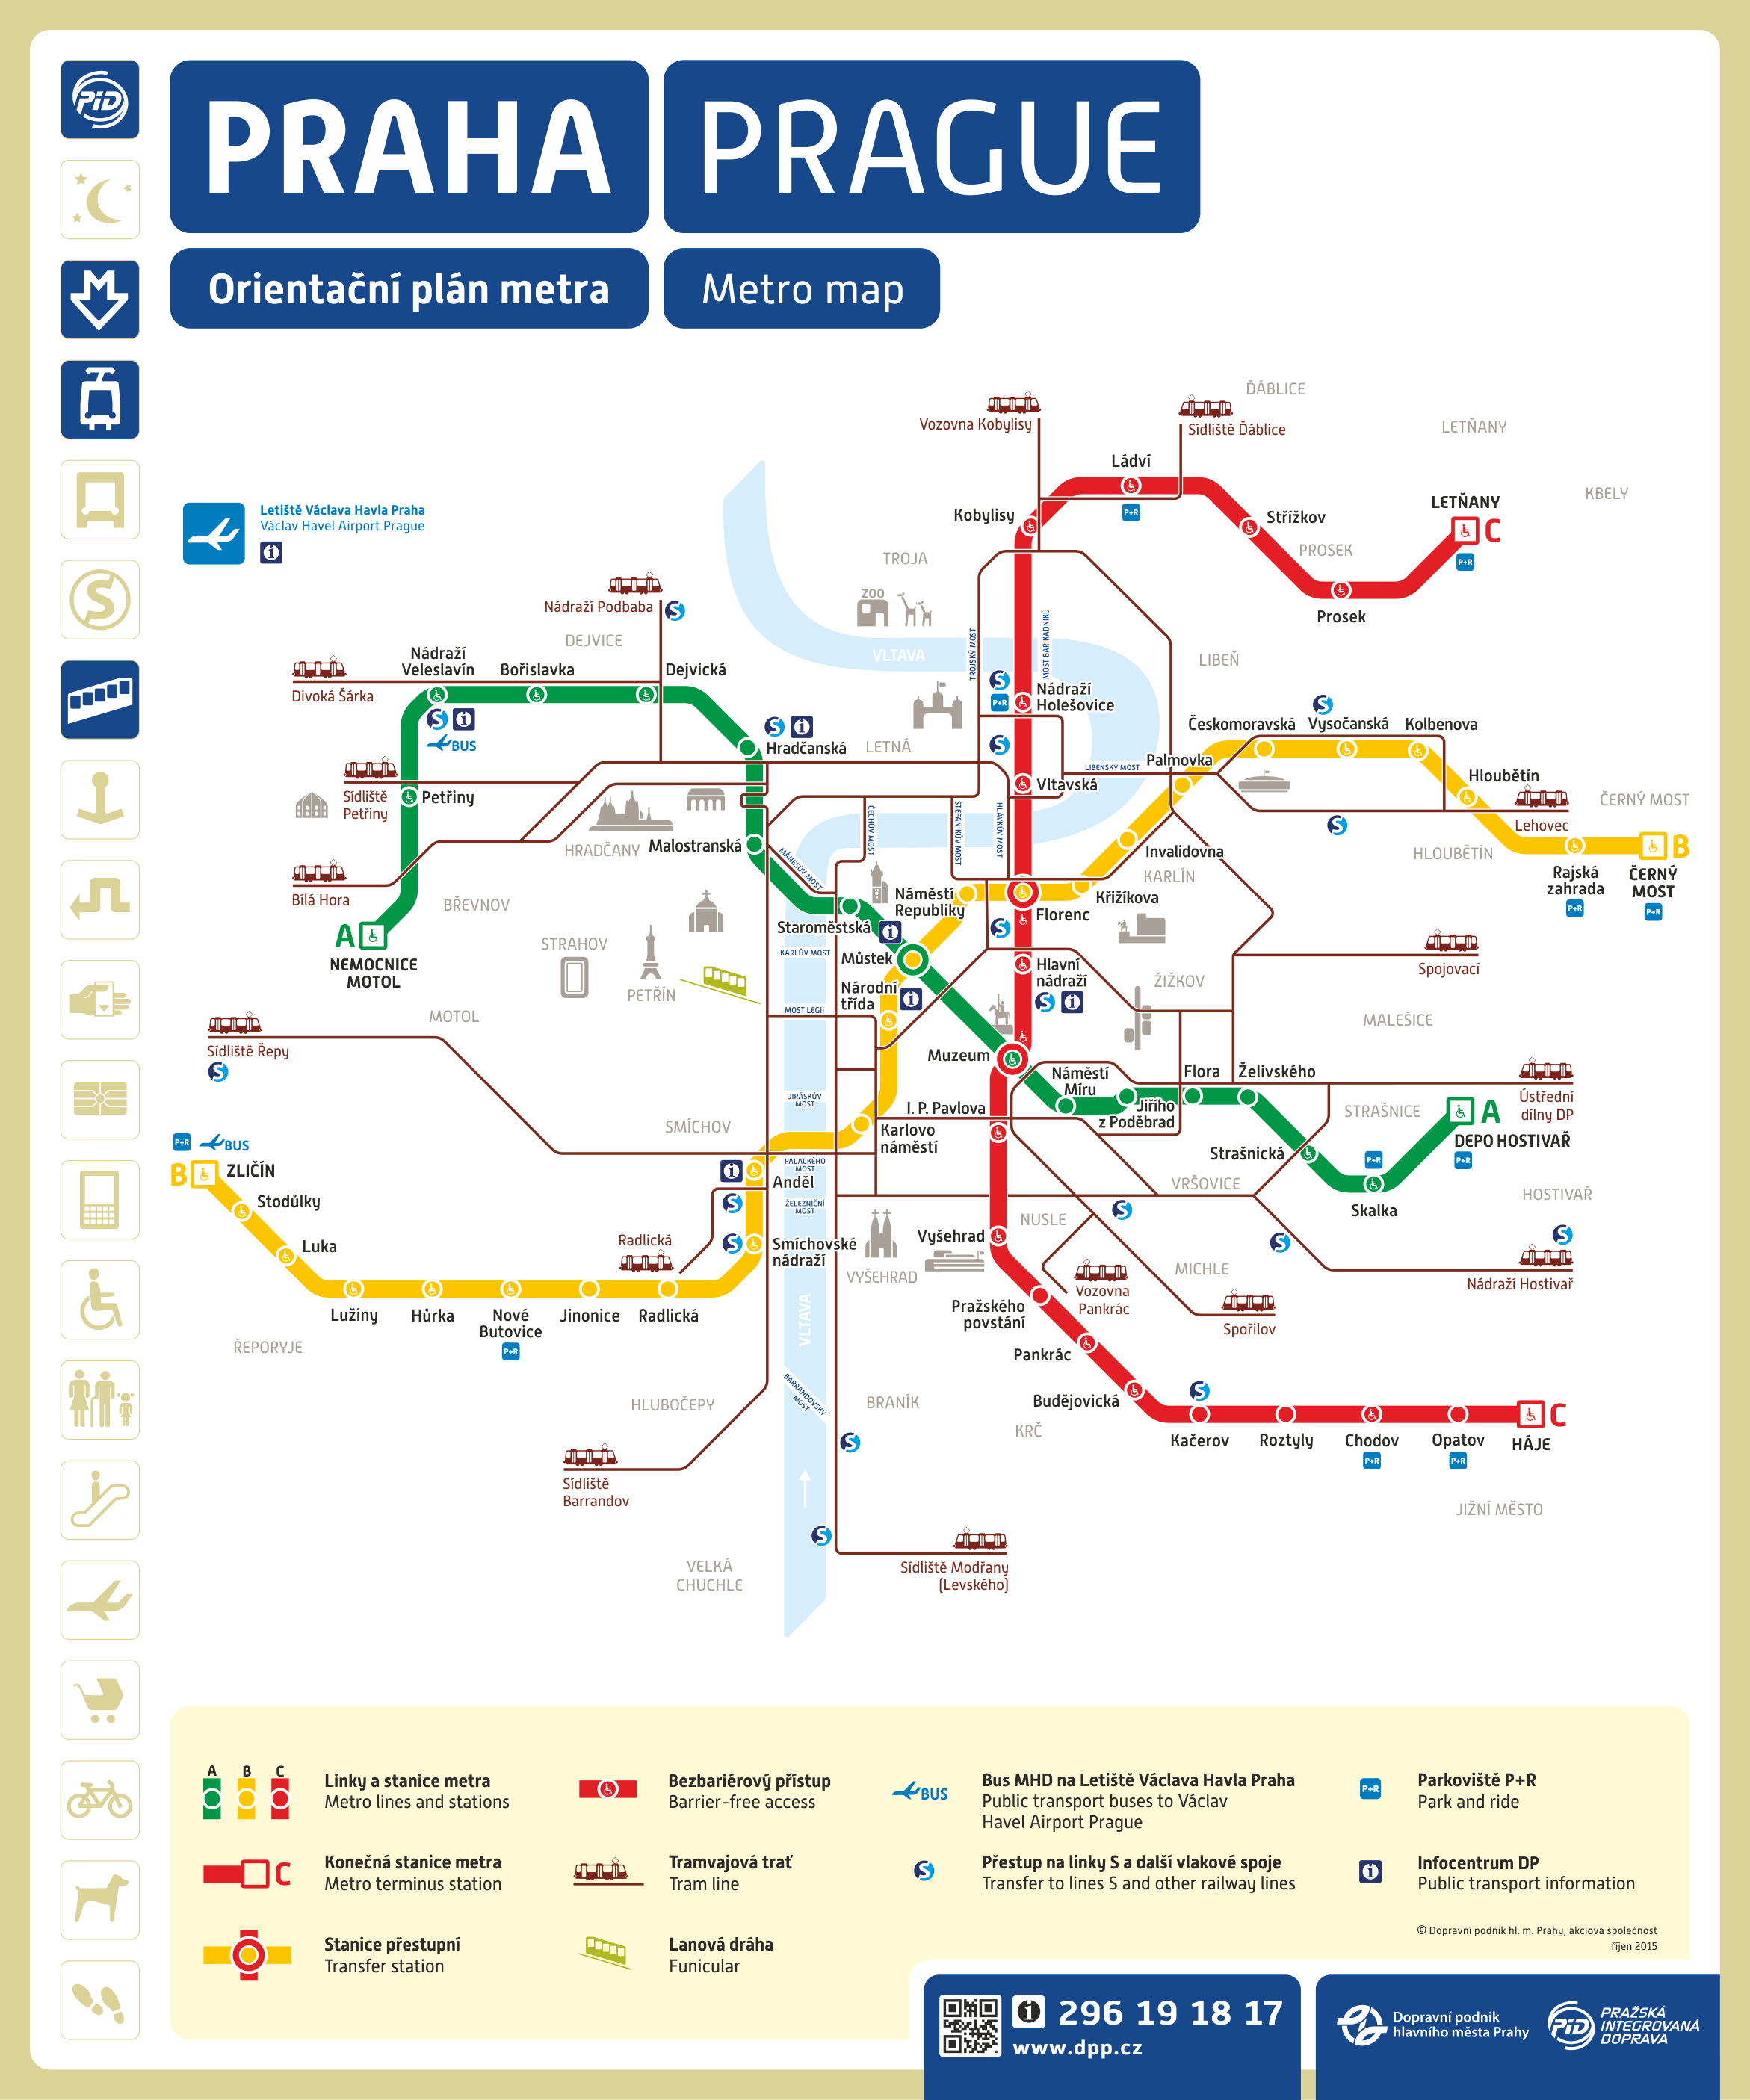 01 metro orientation plan